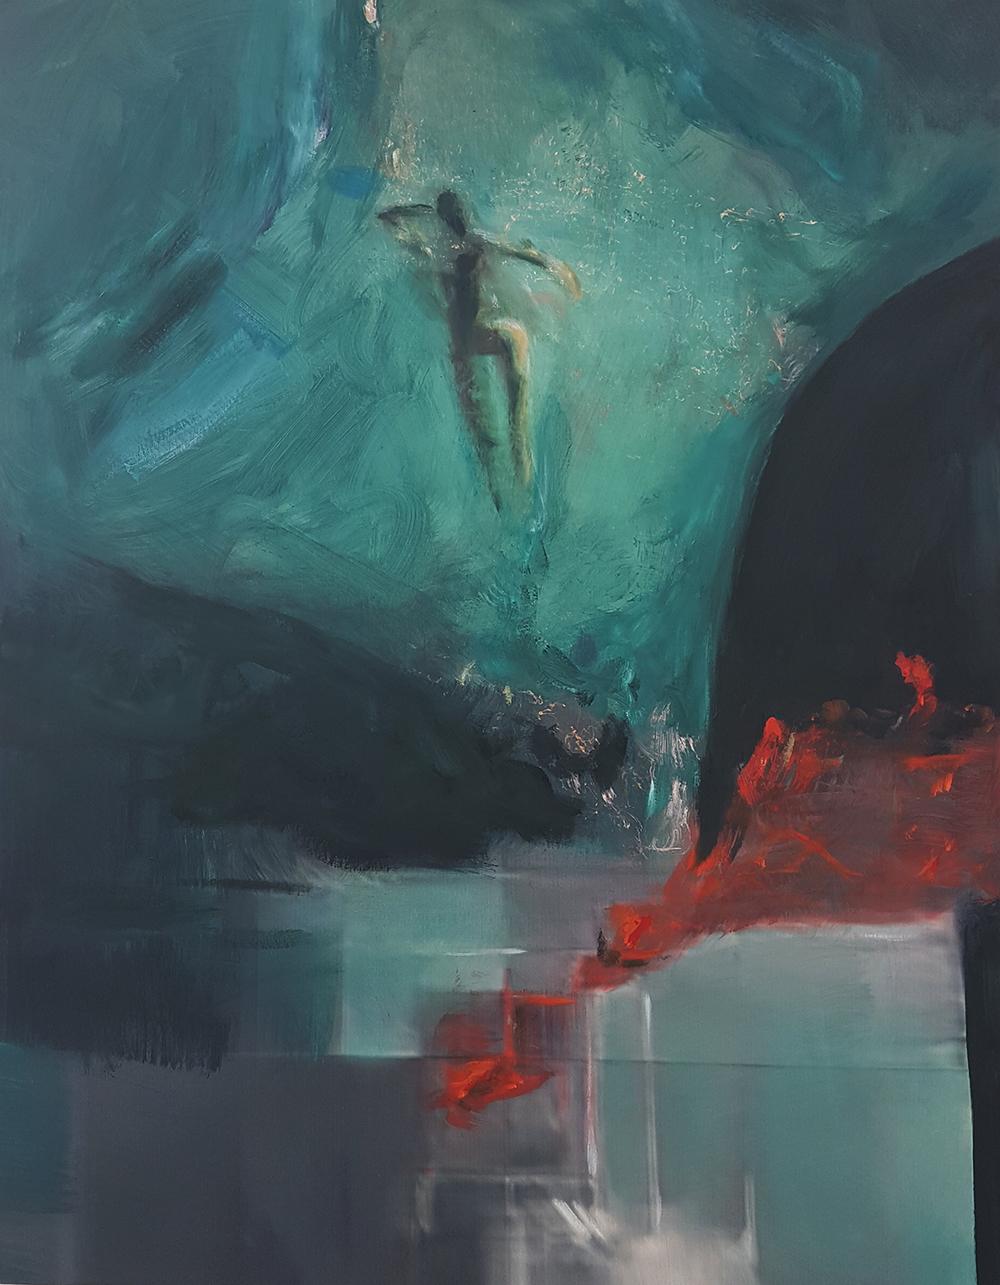 Andrew Hart Adler  Aqua Lady II  Mixed media and digital print on canvas  123 x 97 cm